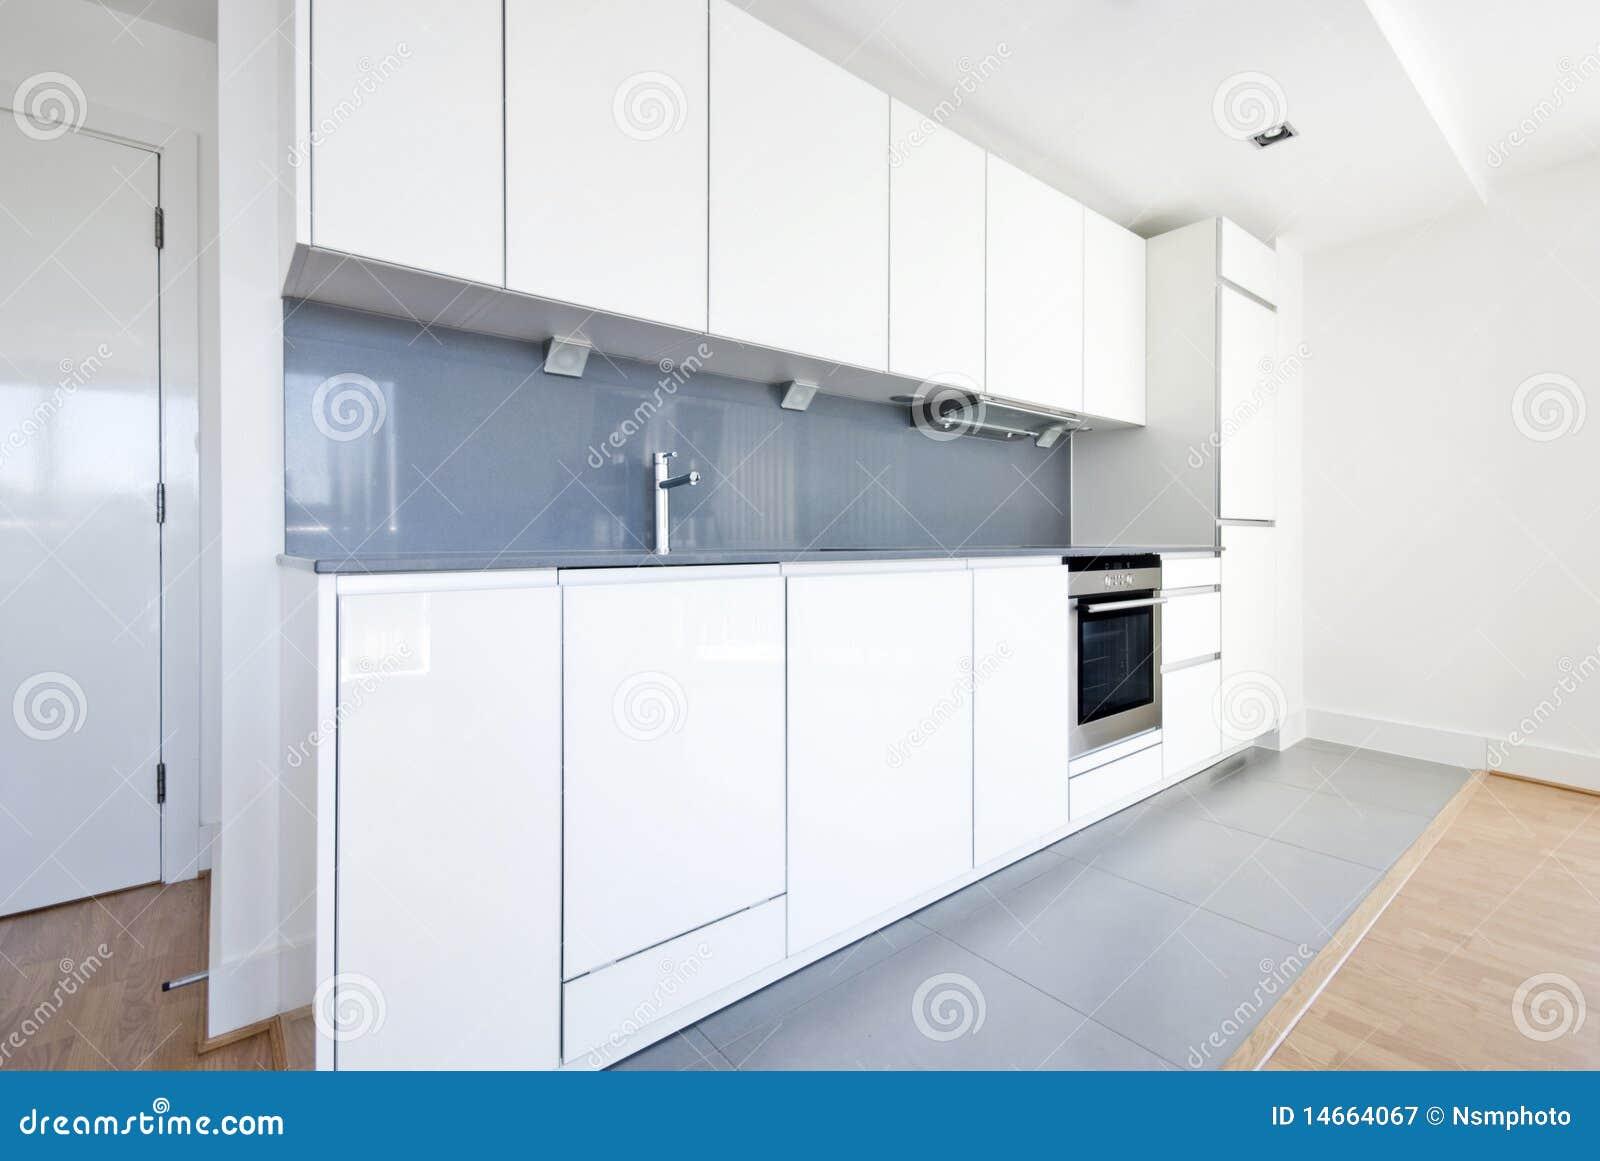 Moderne keuken in wit royalty vrije stock foto's   afbeelding ...